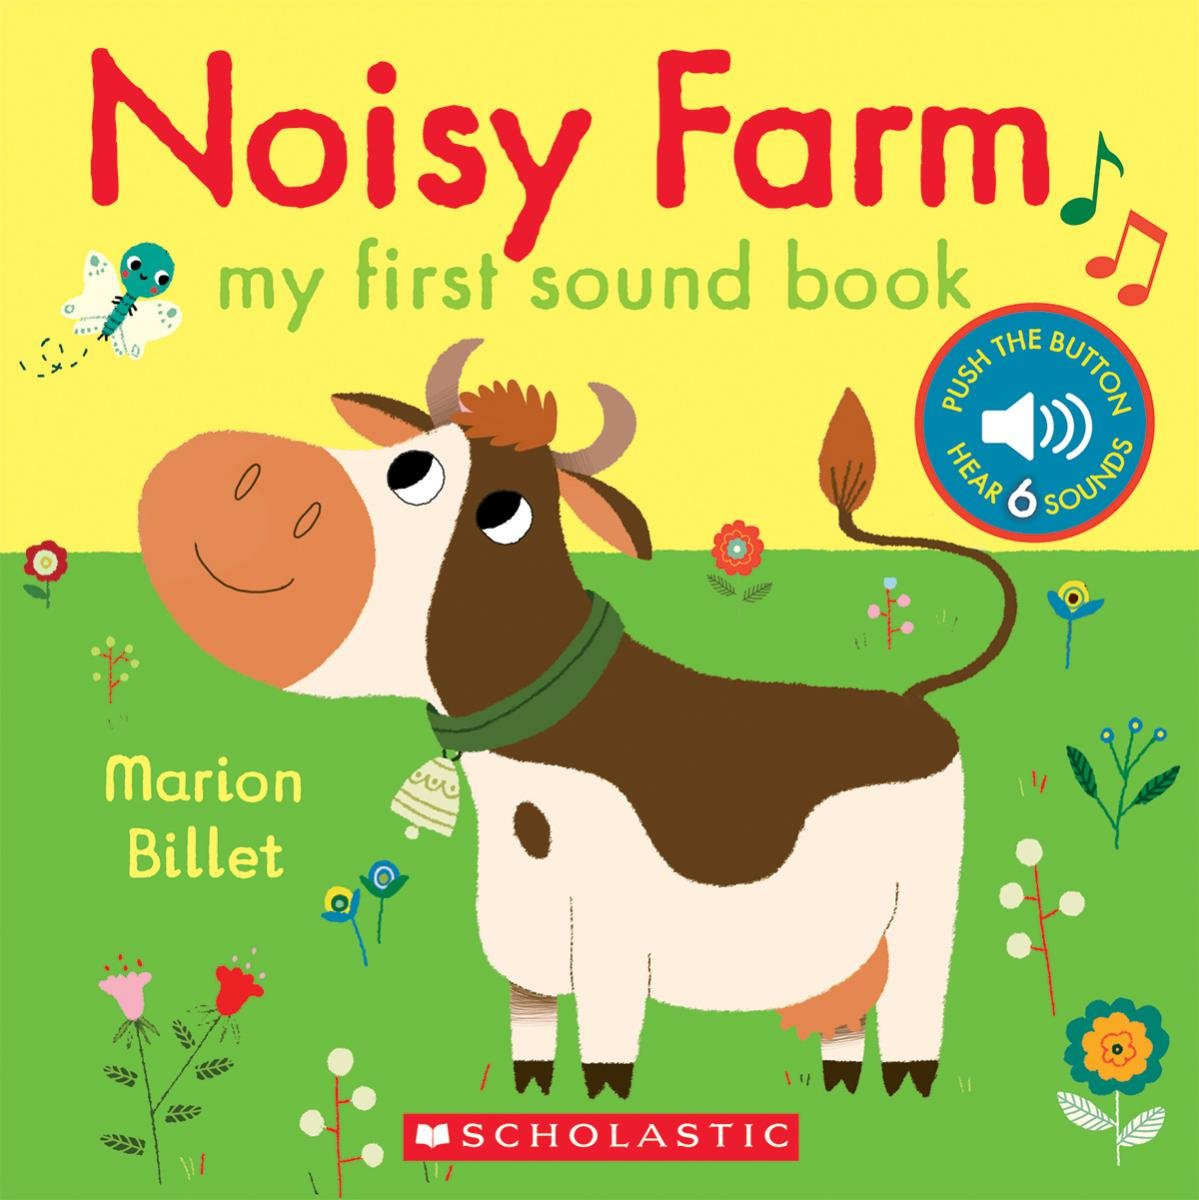 Noisy Farm book cover featuring cartoon cow on green grass